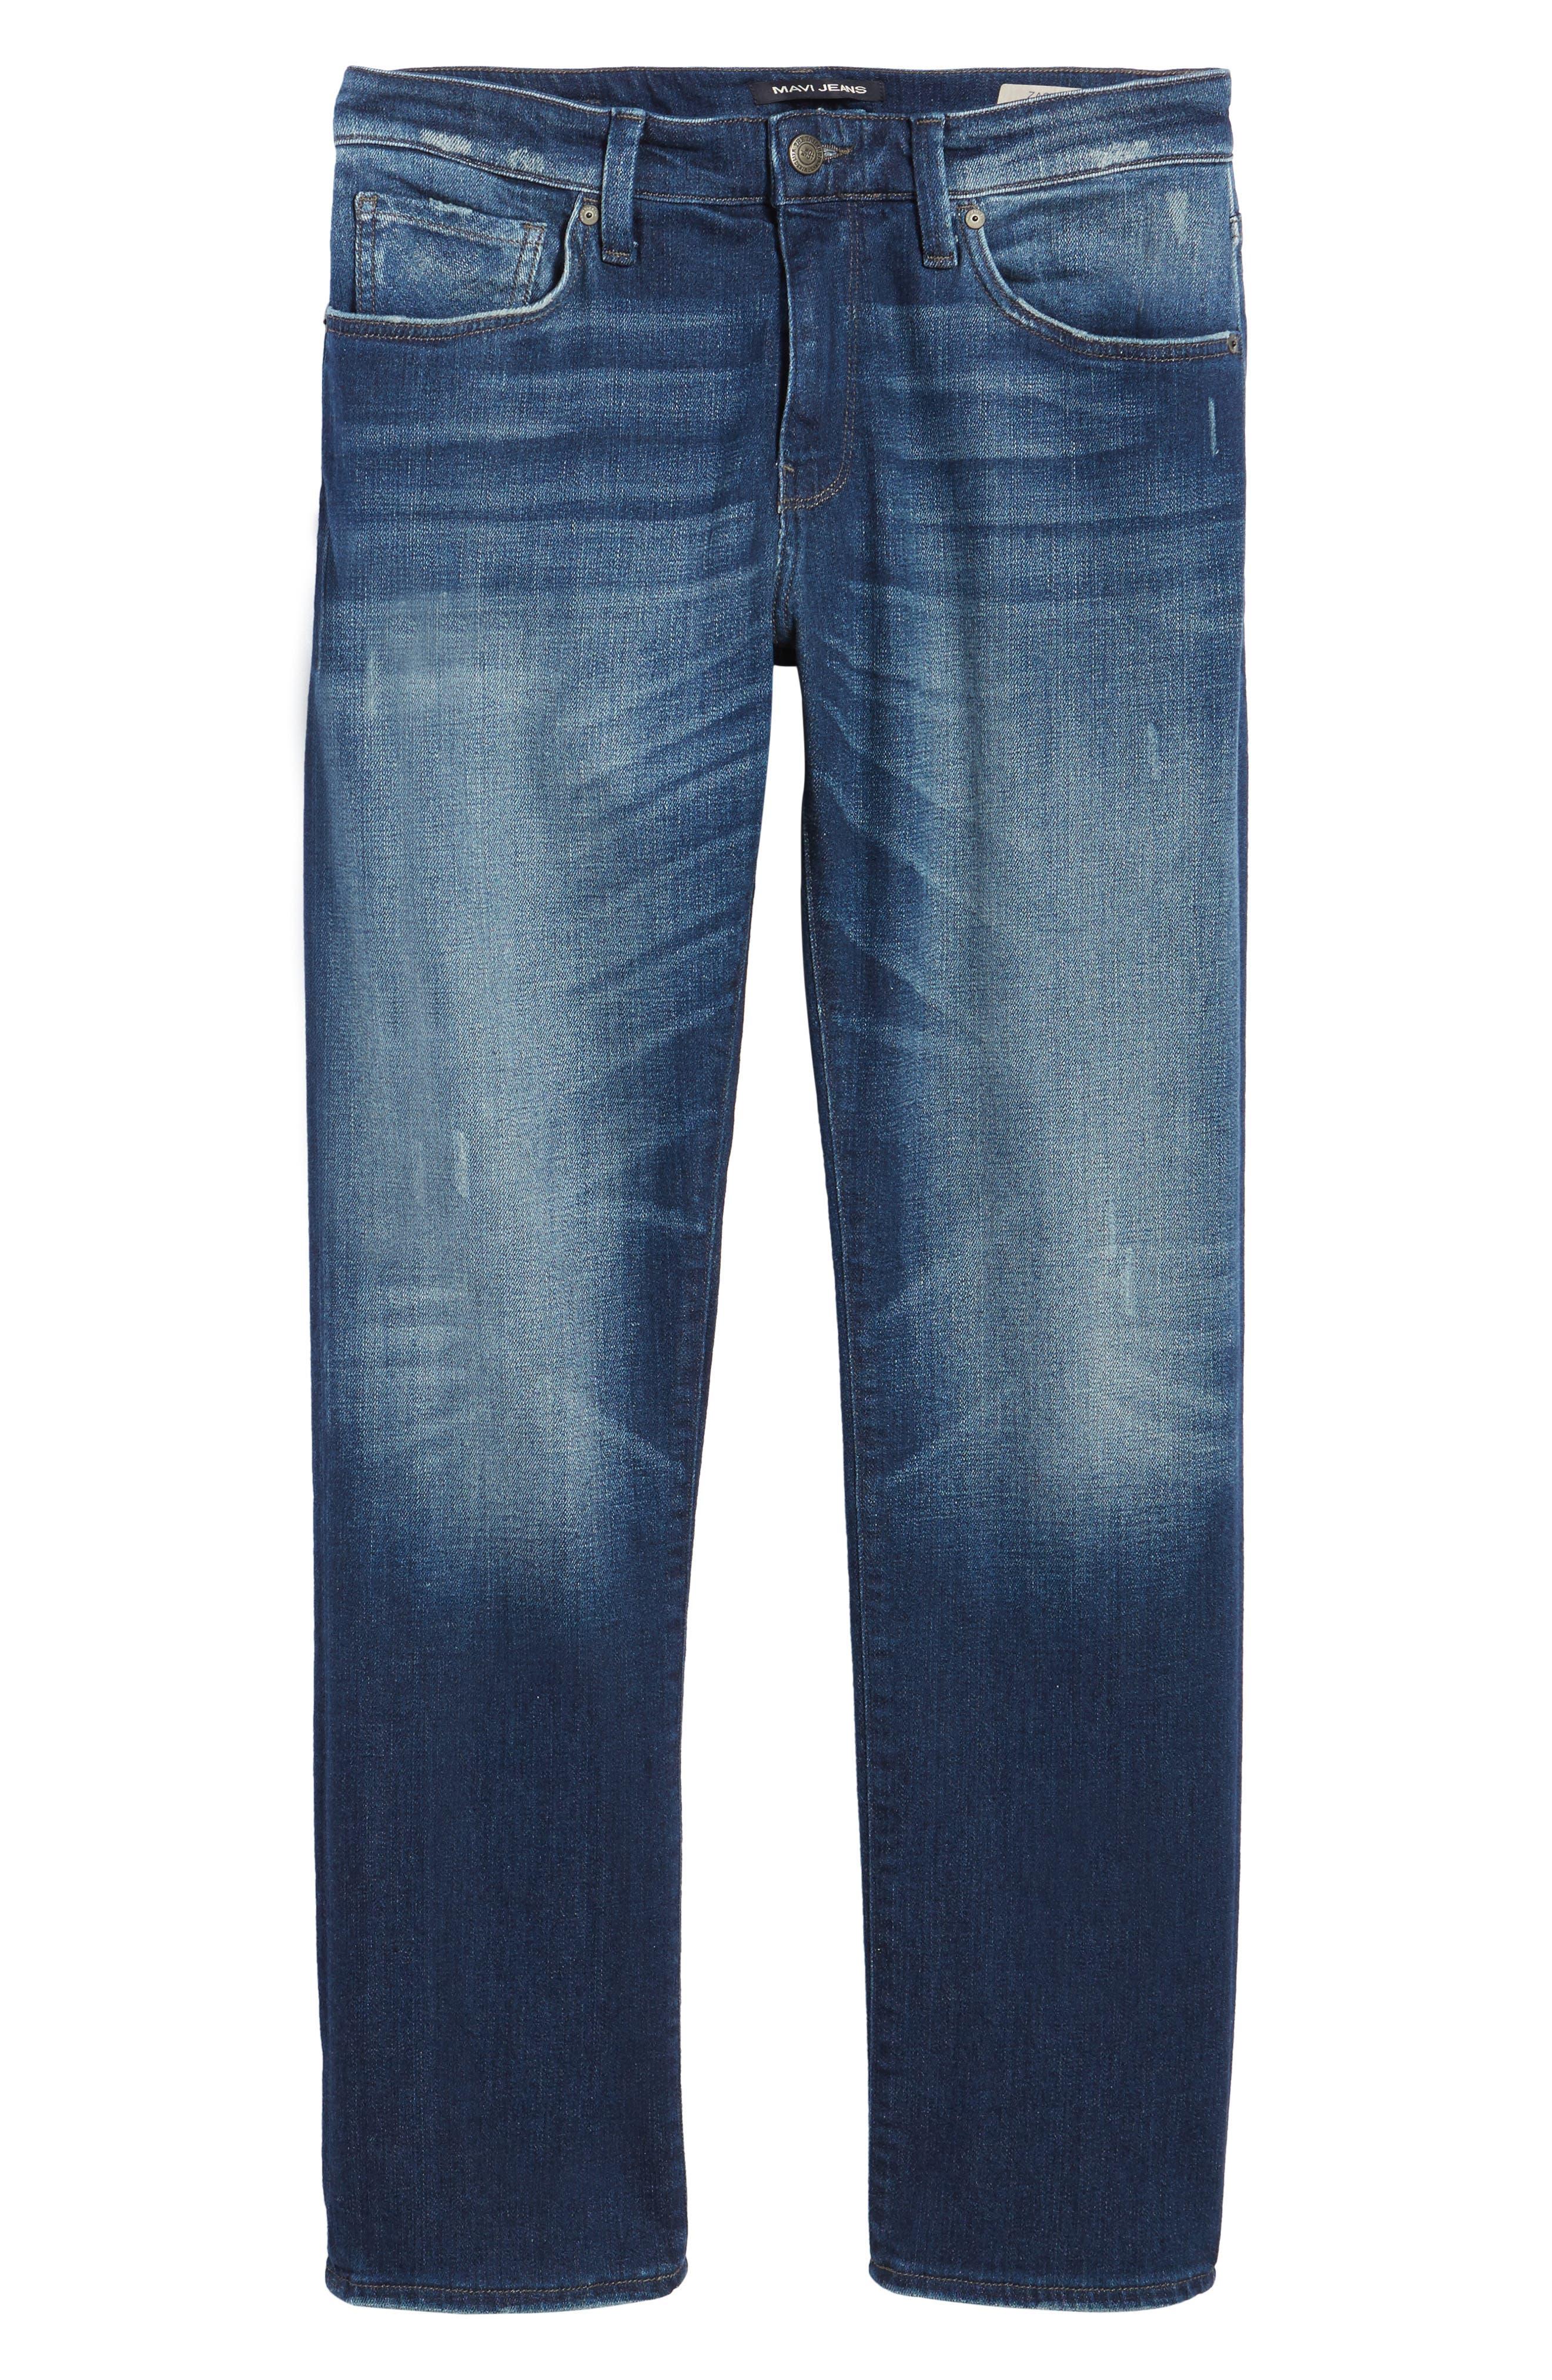 Zach Straight Leg Jeans,                             Alternate thumbnail 6, color,                             Dark Brooklyn